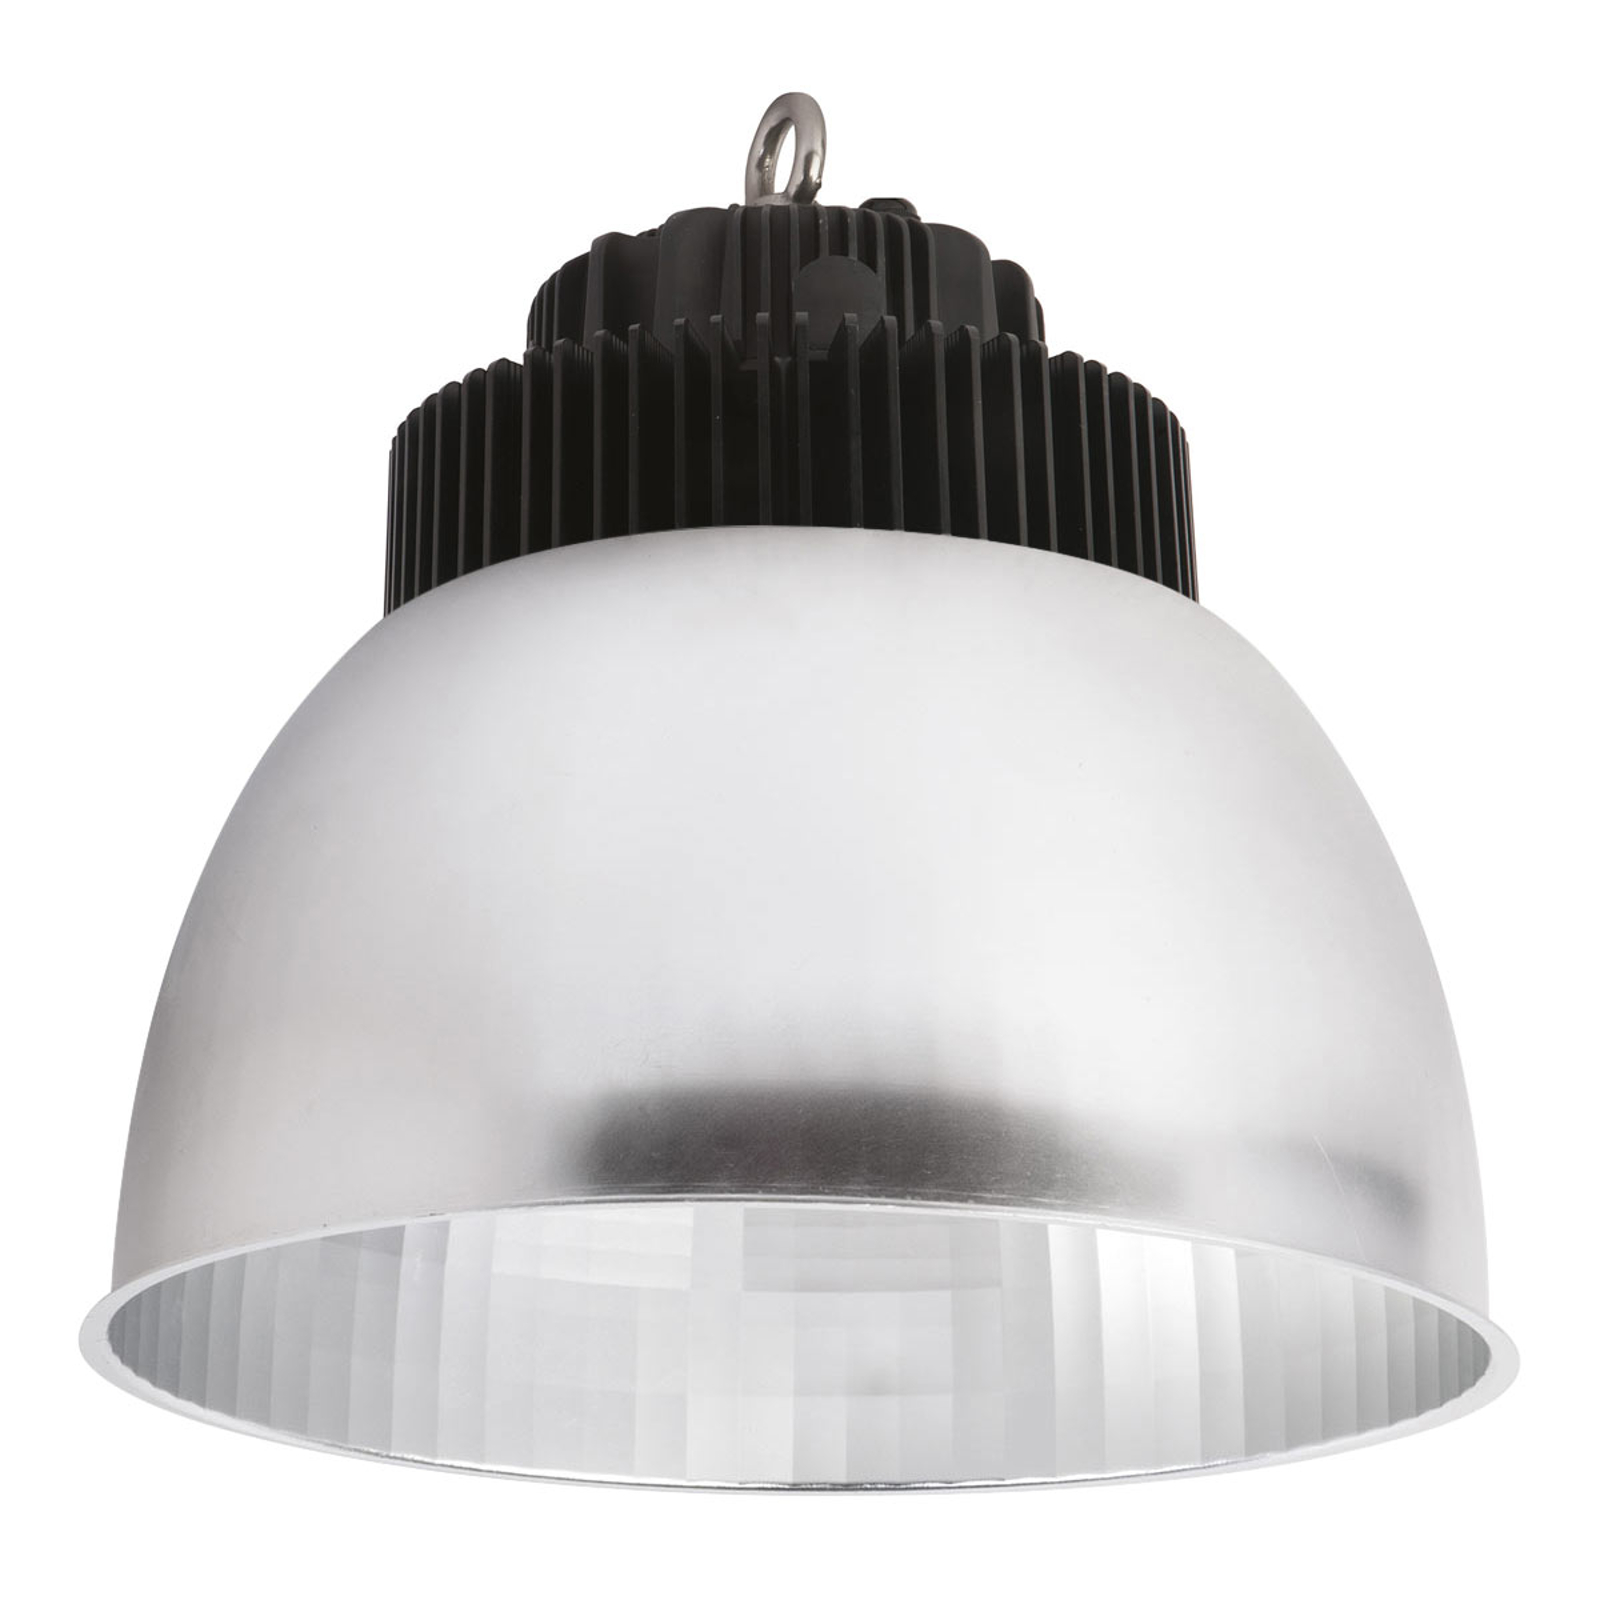 Leistungsstarker LED-Hallenstrahler Luster 65 W